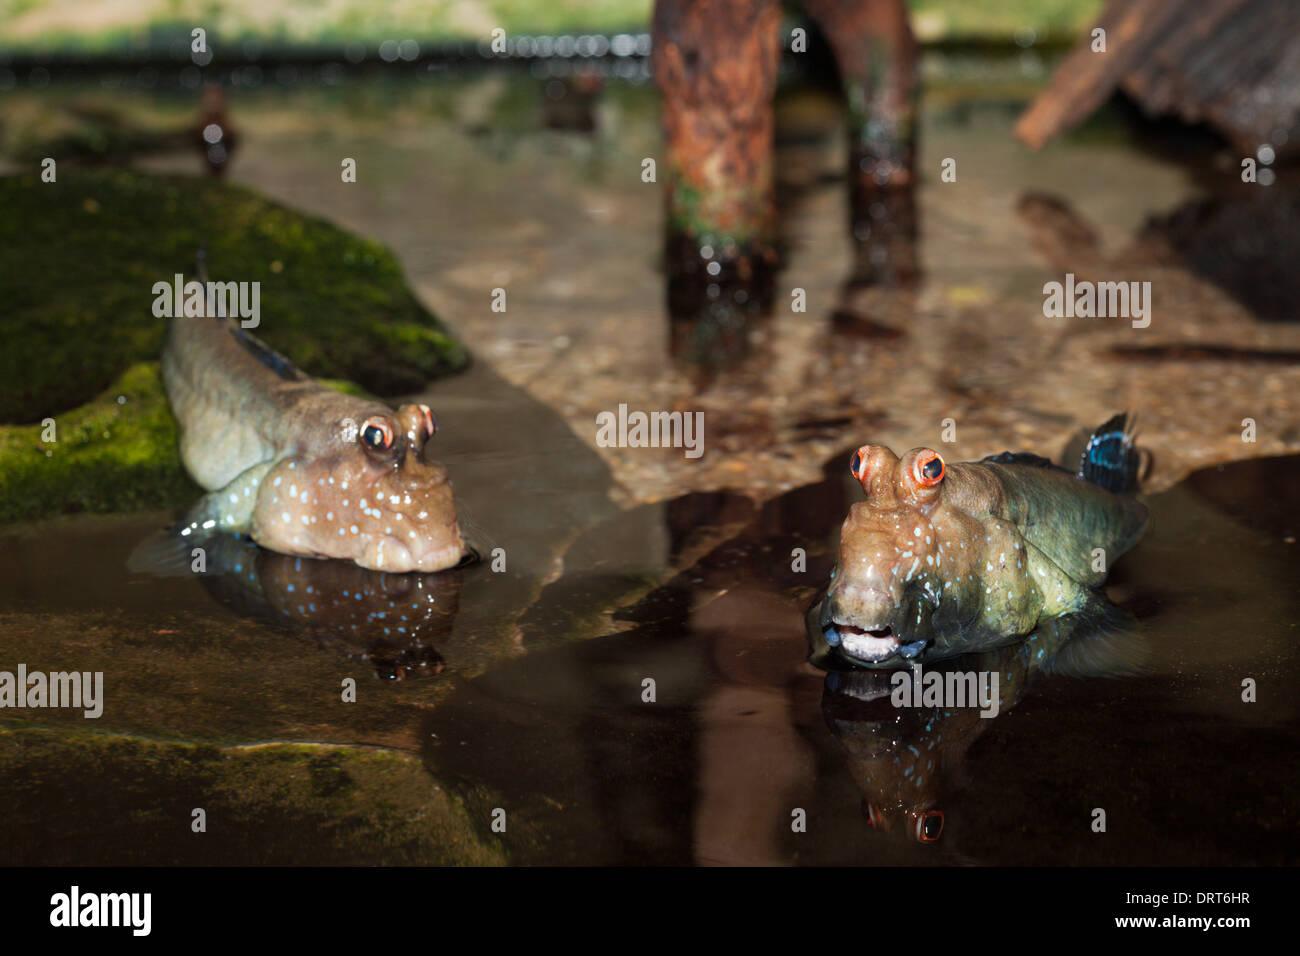 Mudskipper, Periophthalmus spec., Mozambique - Stock Image